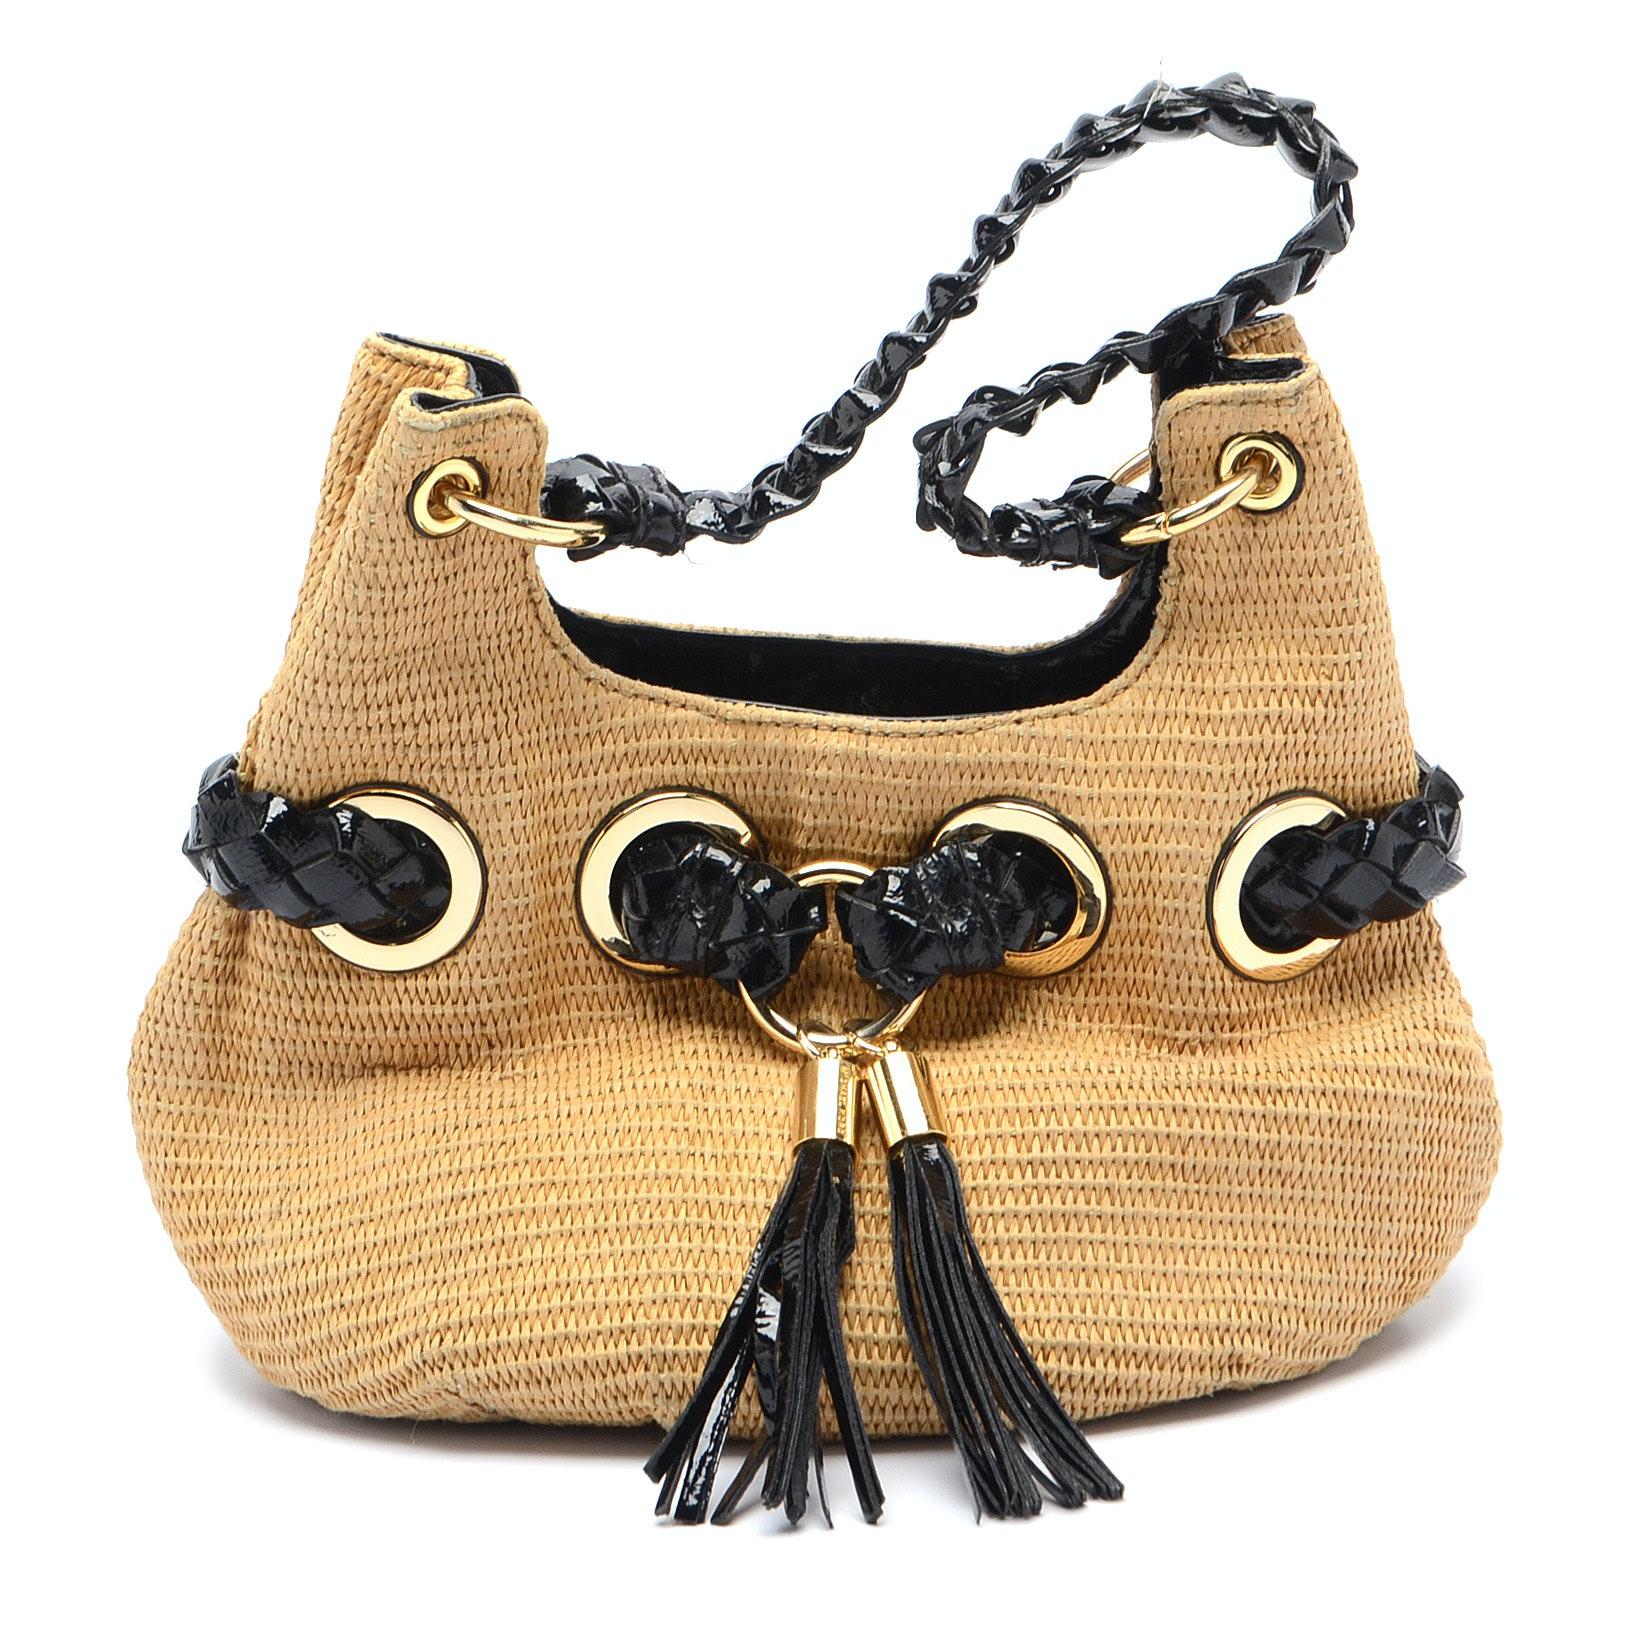 Michael Kors Woven Patent Handbag